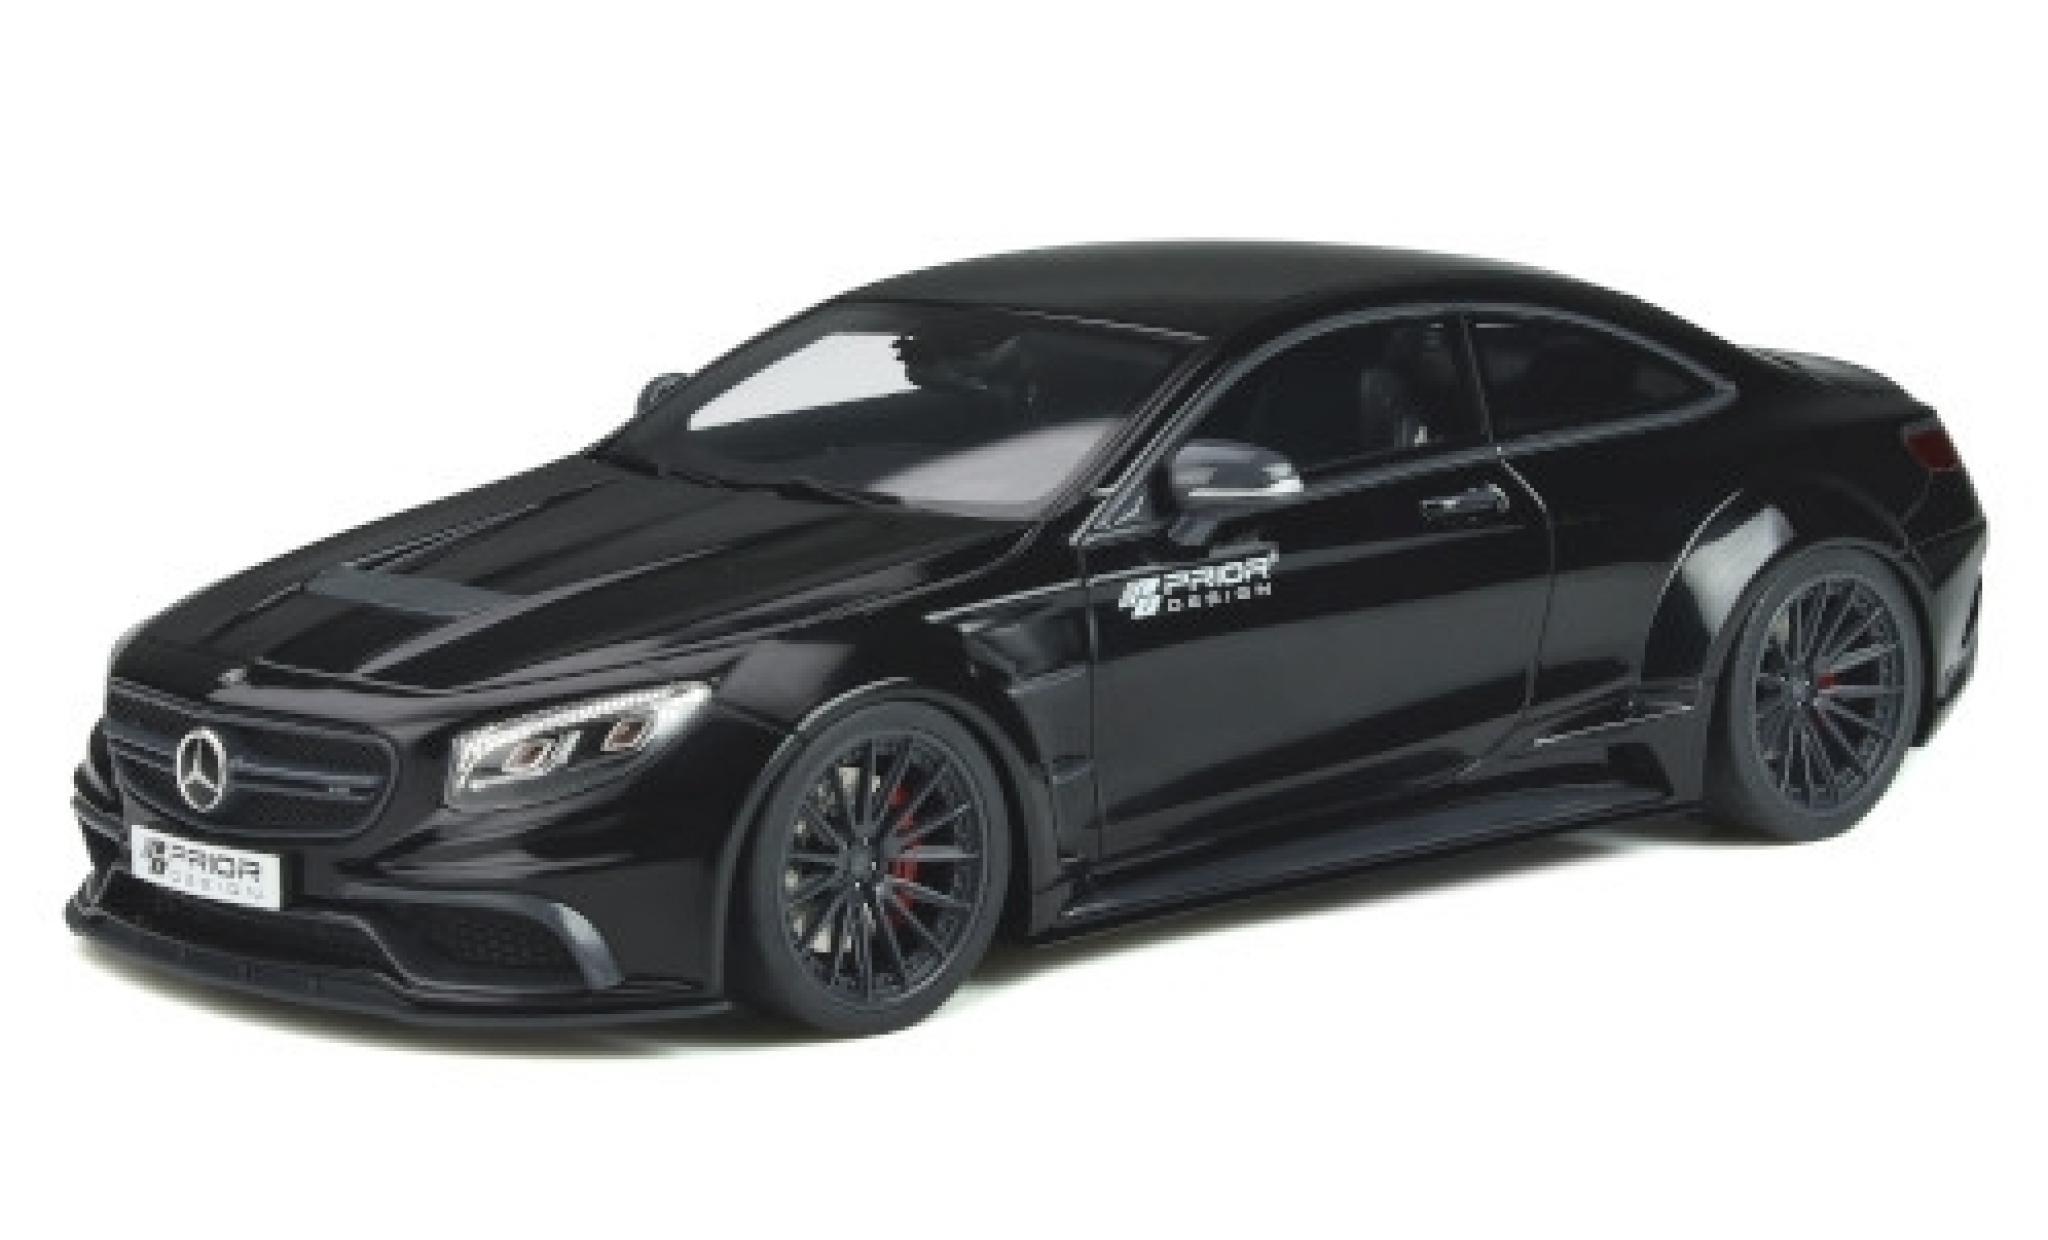 Mercedes CLA 1/18 GT Spirit Prior Design PD75SC black/Dekor 2017 Basis: MB S-classe Coupe (C217)